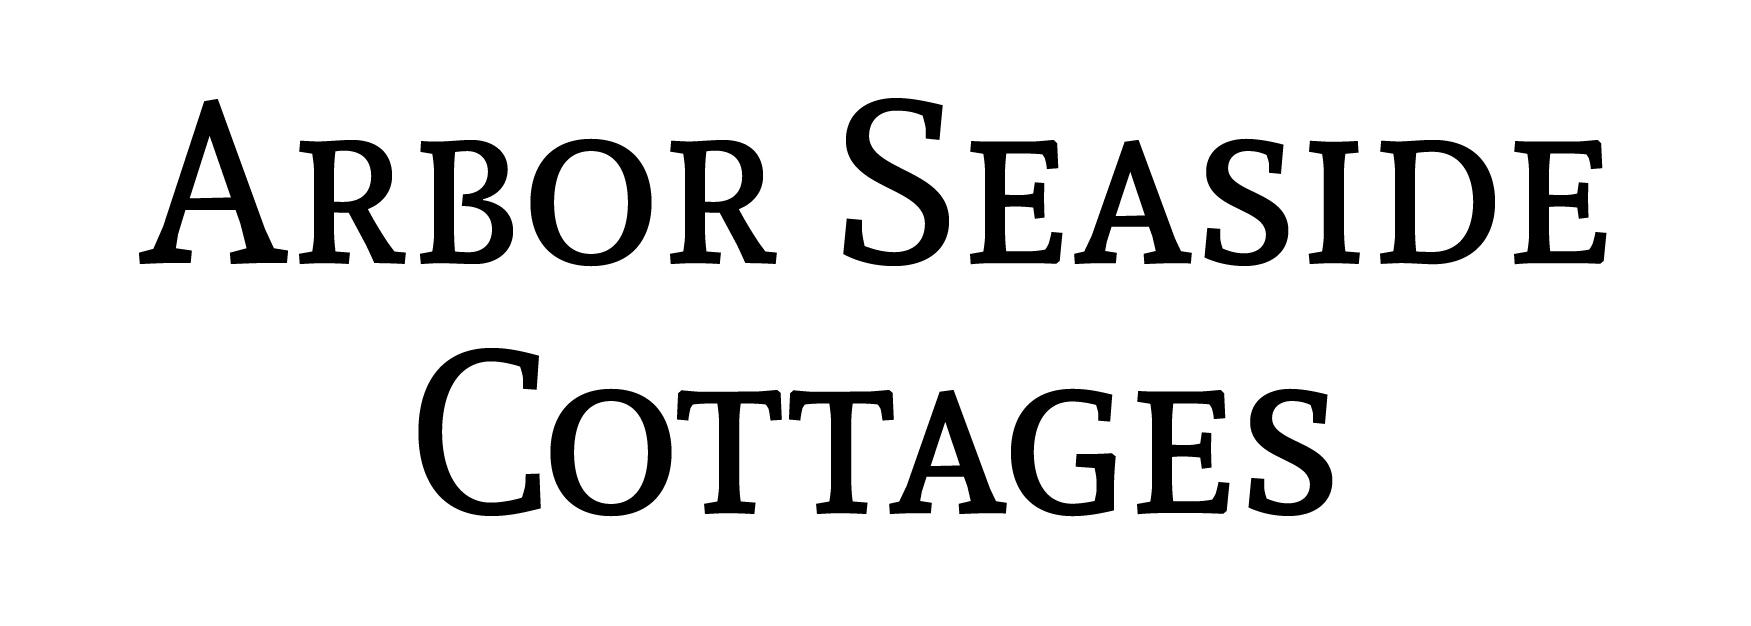 Arbor Seaside Cottages